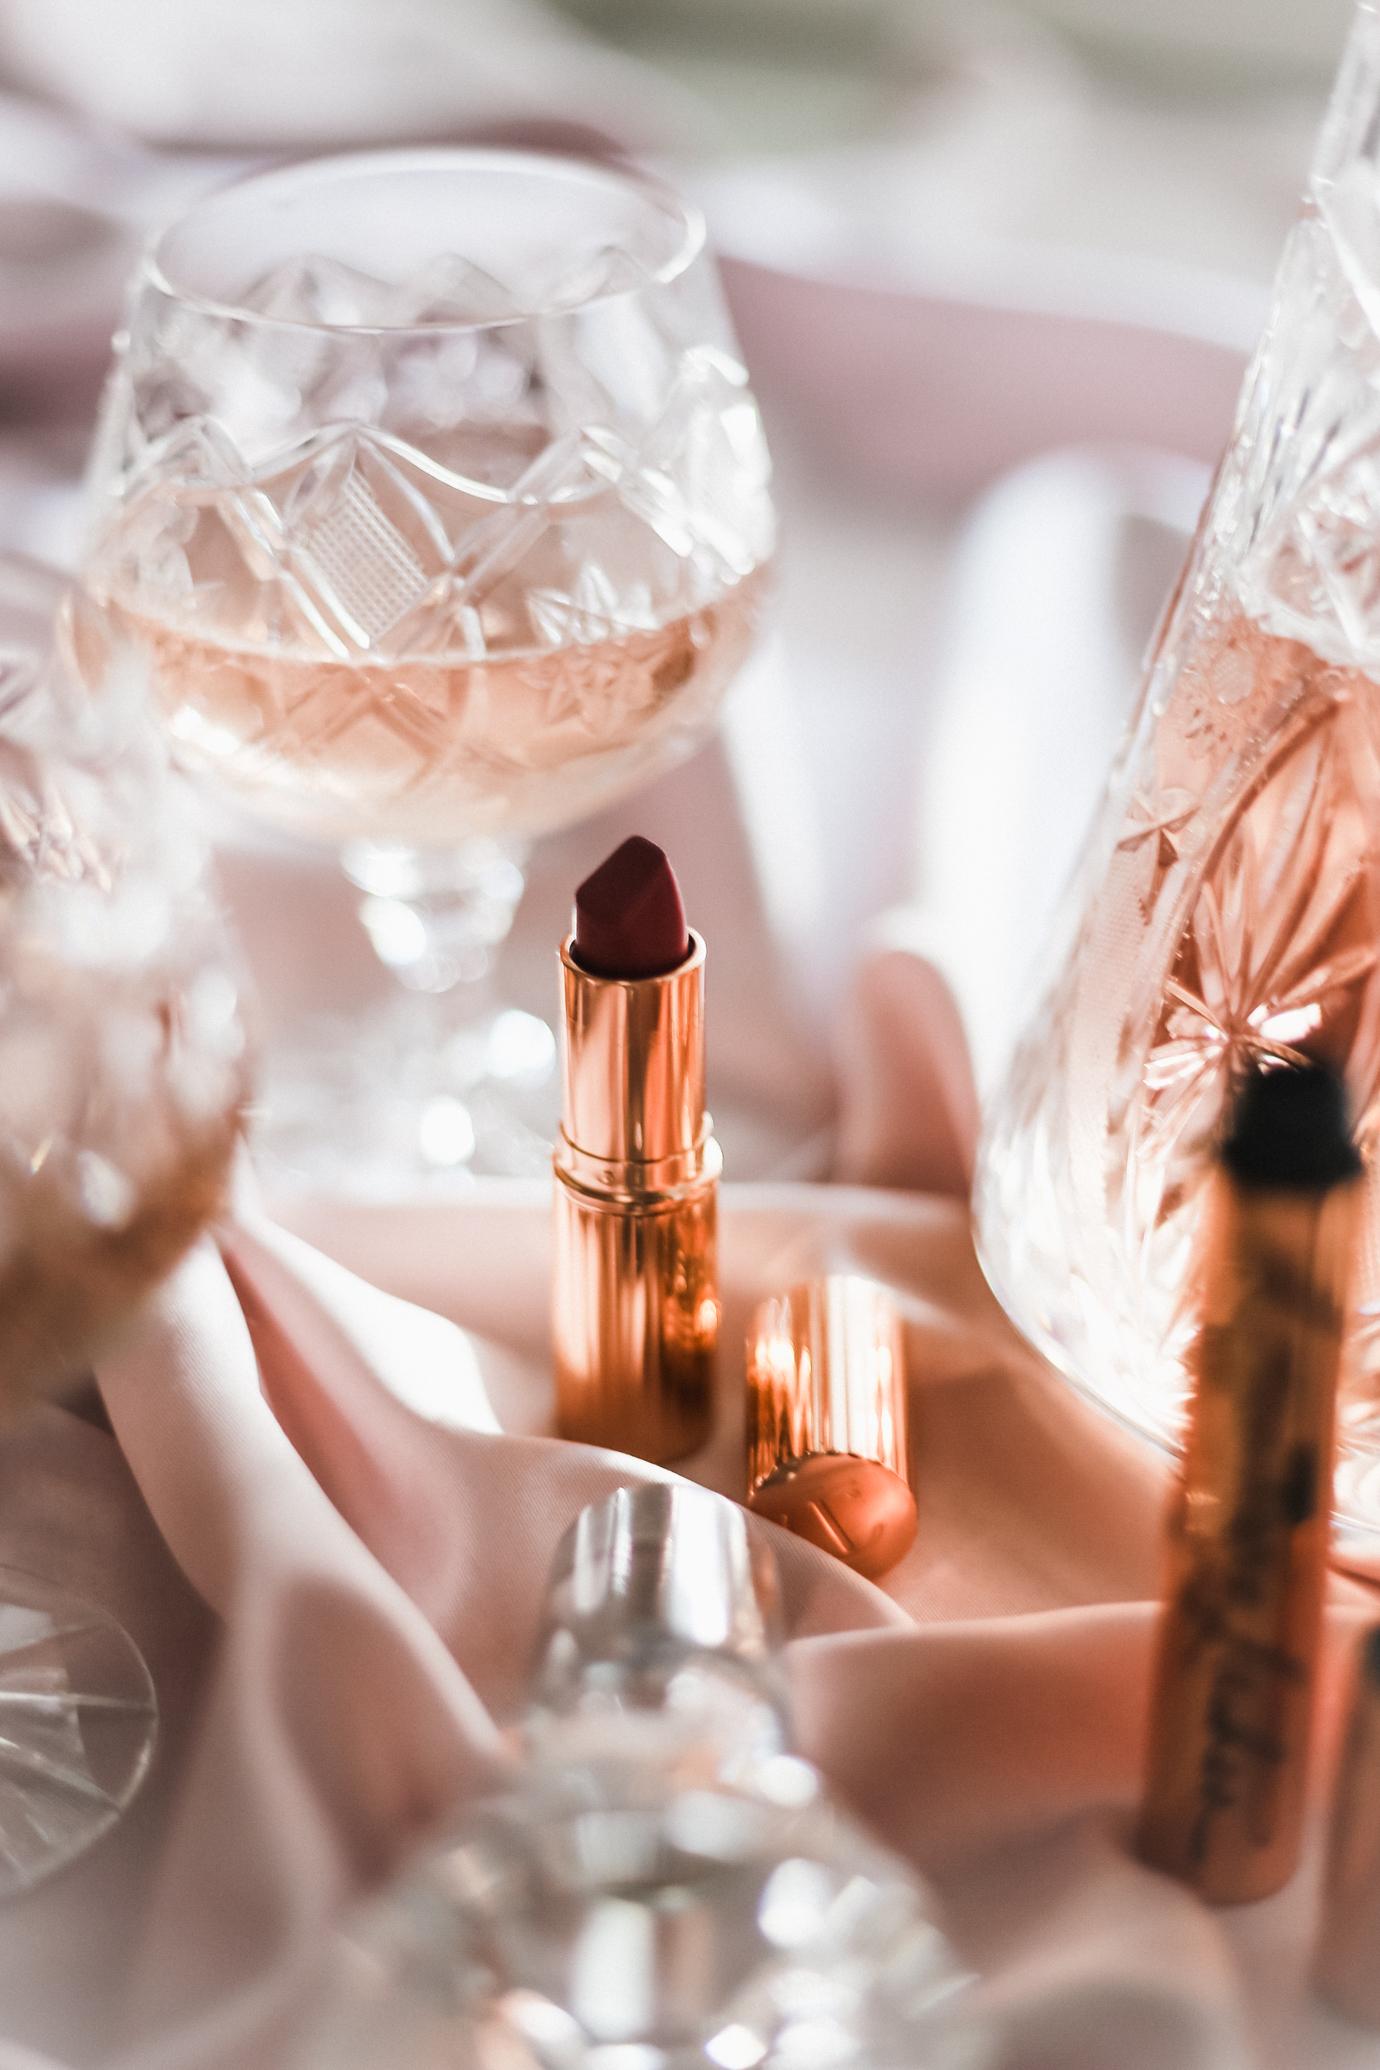 Livia-Auer-Charlotte-Tilbury-Amazin-Grace-Lipstick